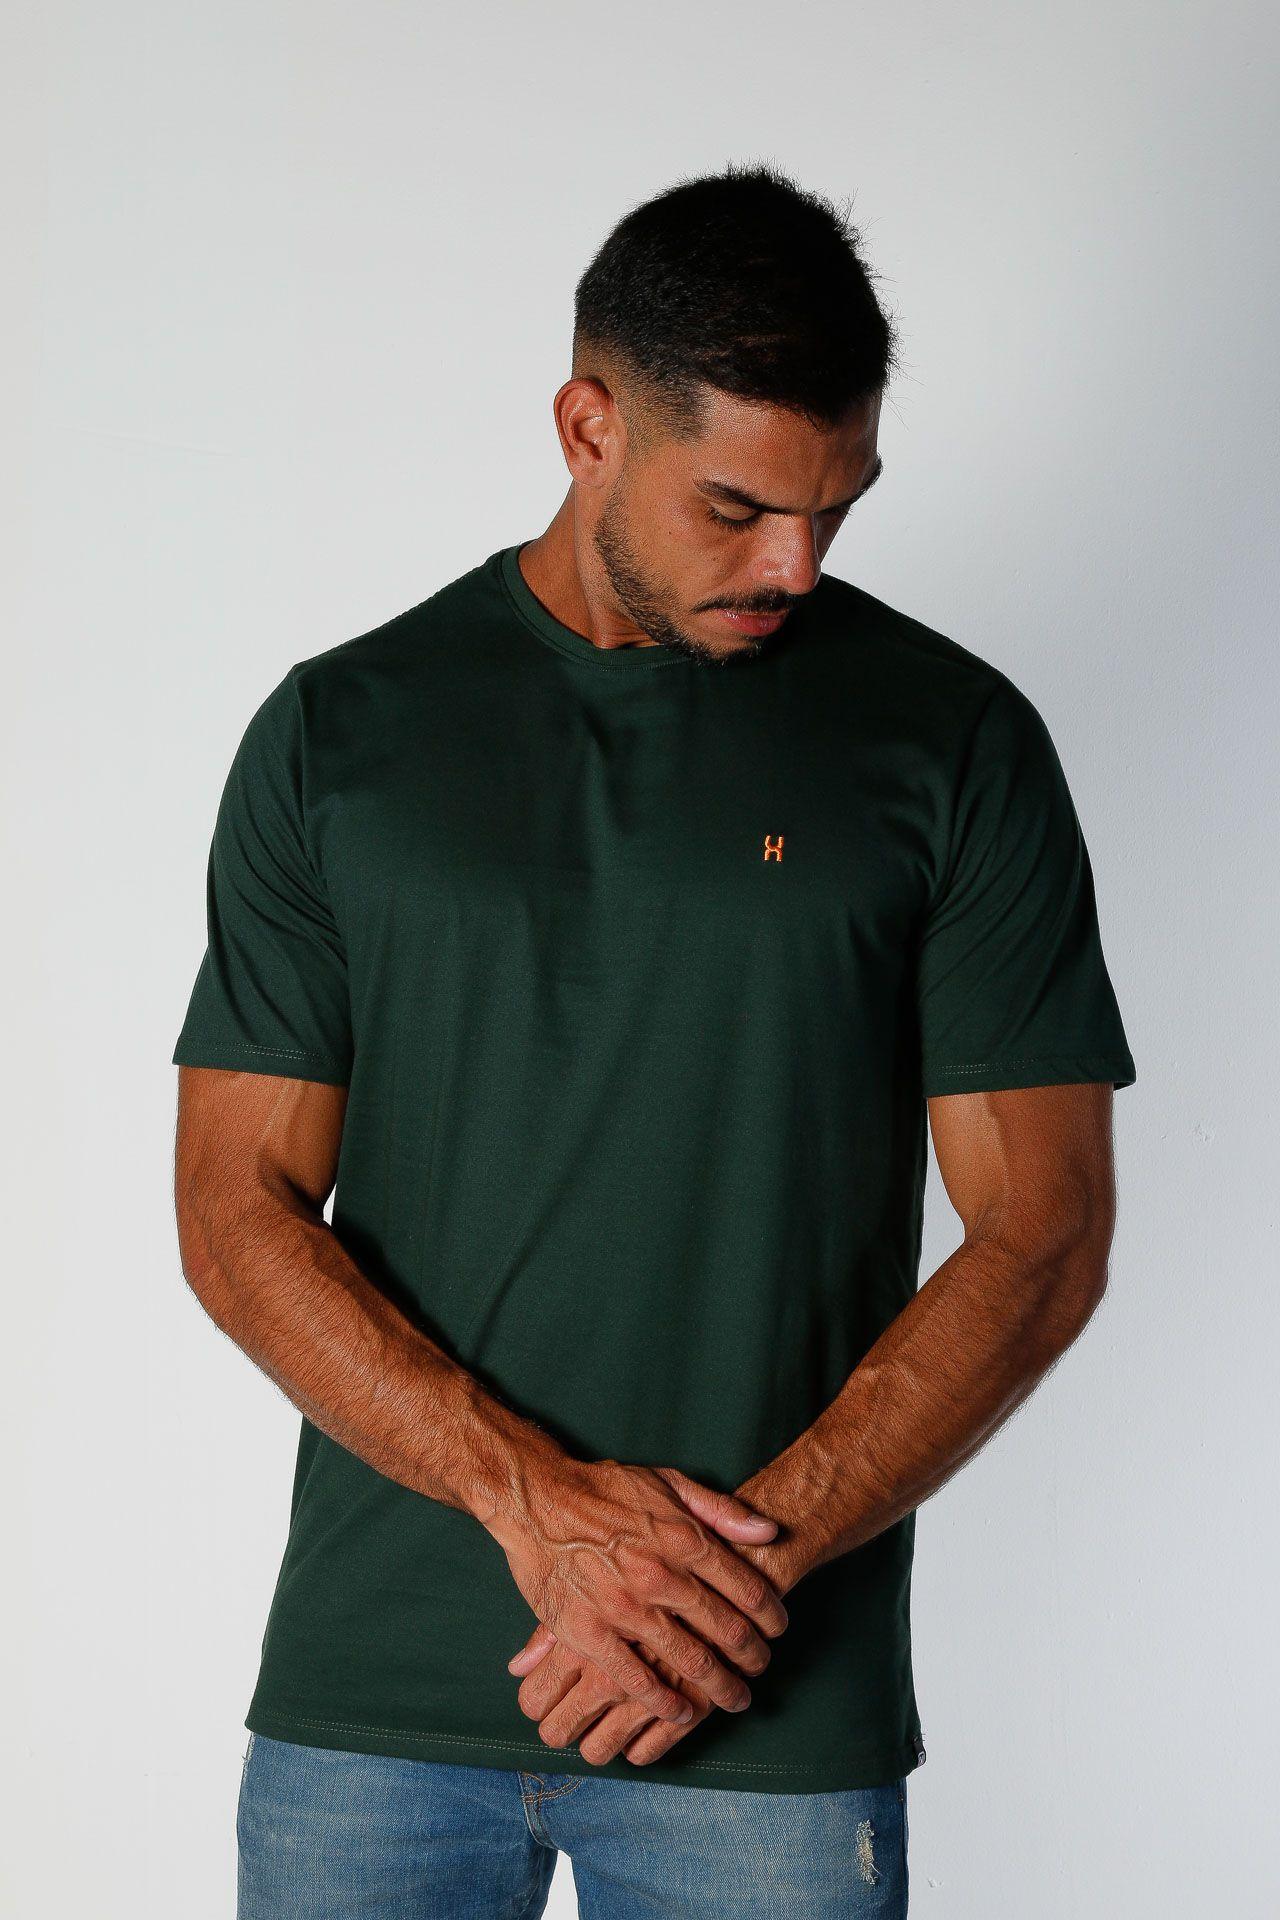 Camiseta Masculina TXC 1806